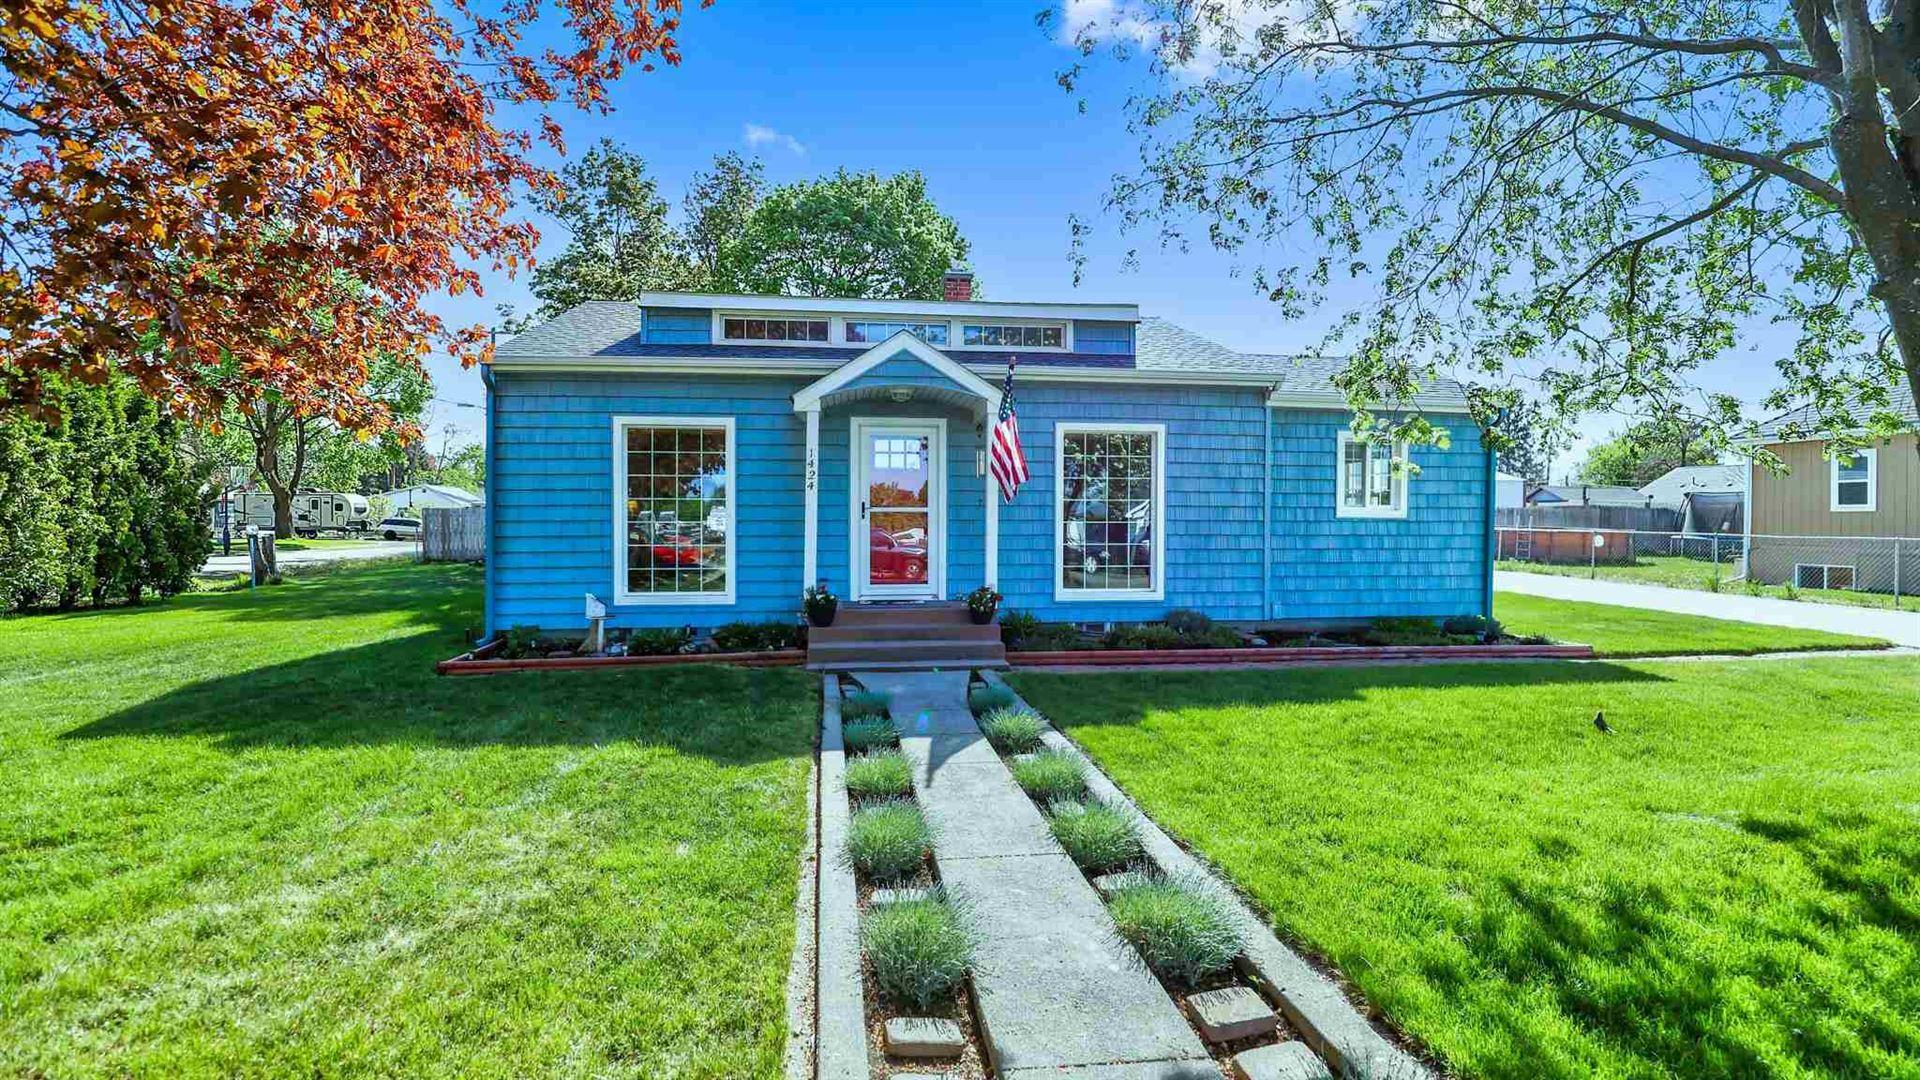 1424 N Greenacres Rd, Spokane Valley, WA 99016-9543 - #: 202115300